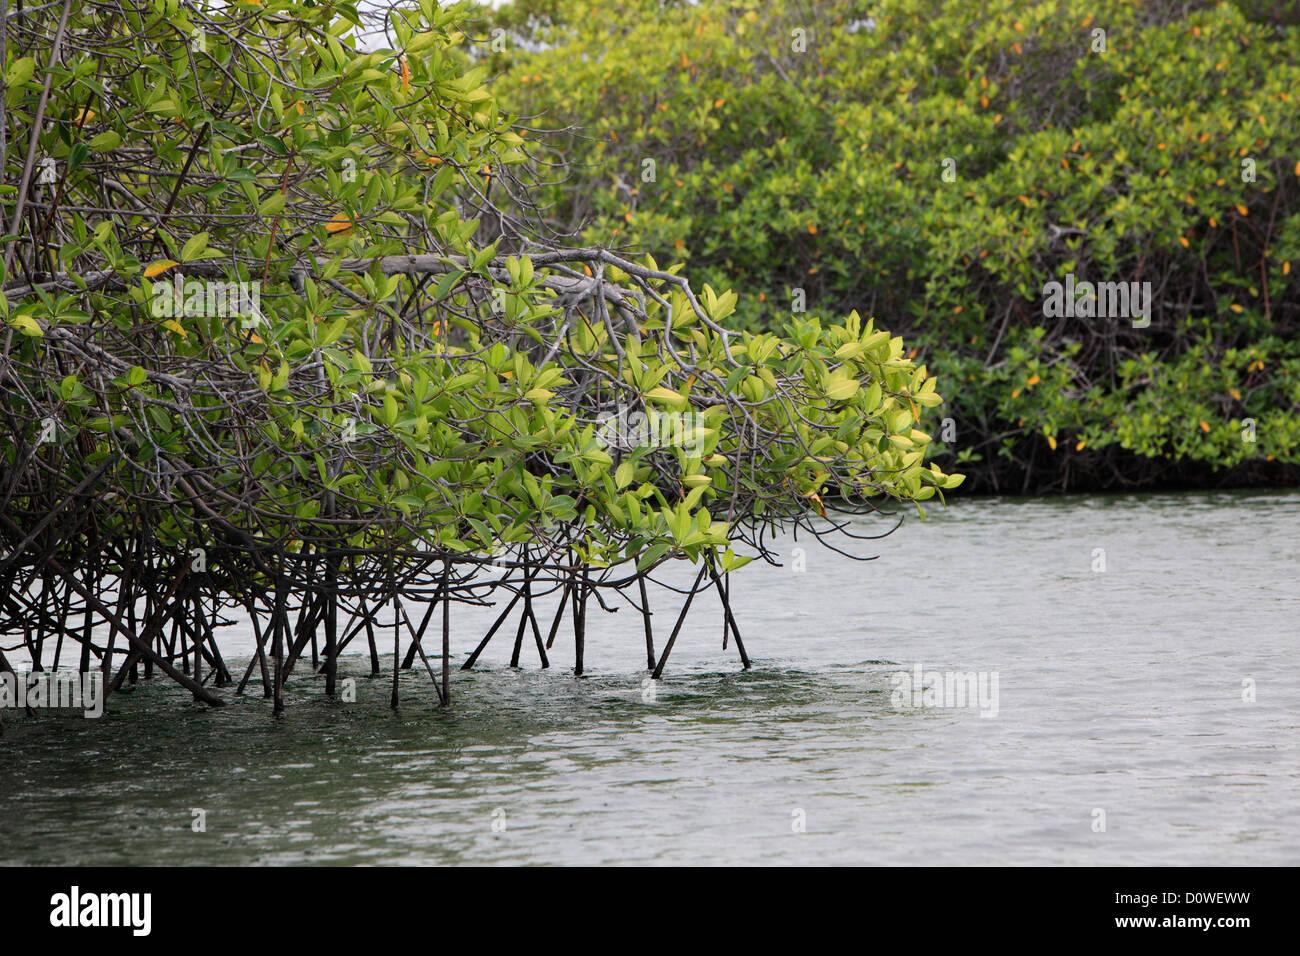 mangroves in Elisabeth bay, Isabela Island, on the Galapagos Islands, Ecuador - Stock Image